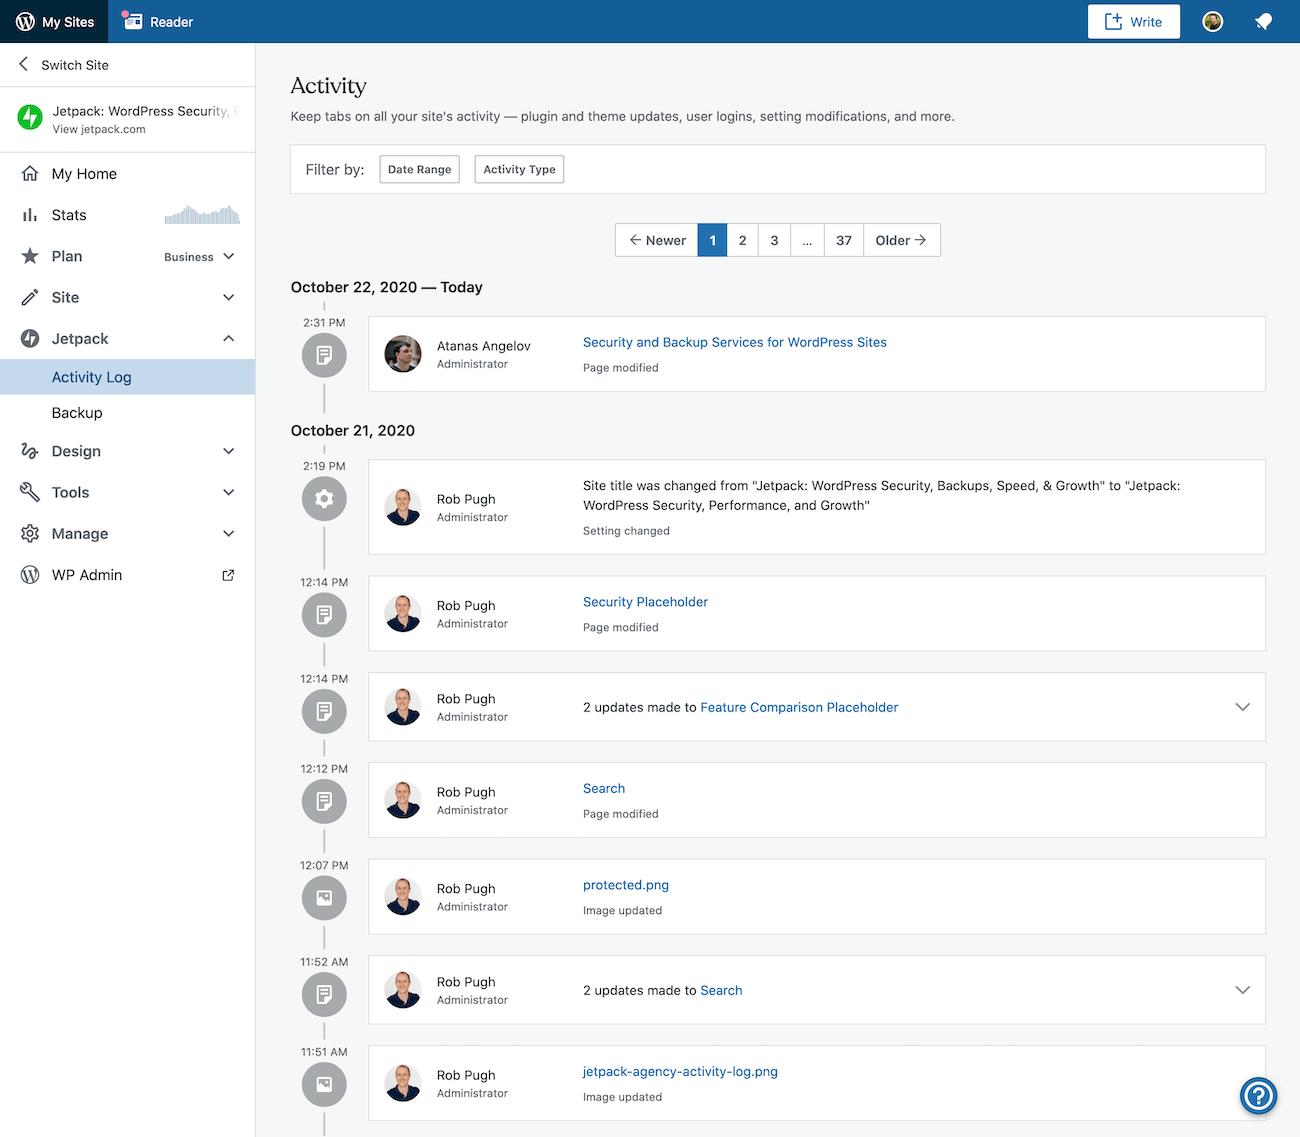 Jetpack activity log with backups